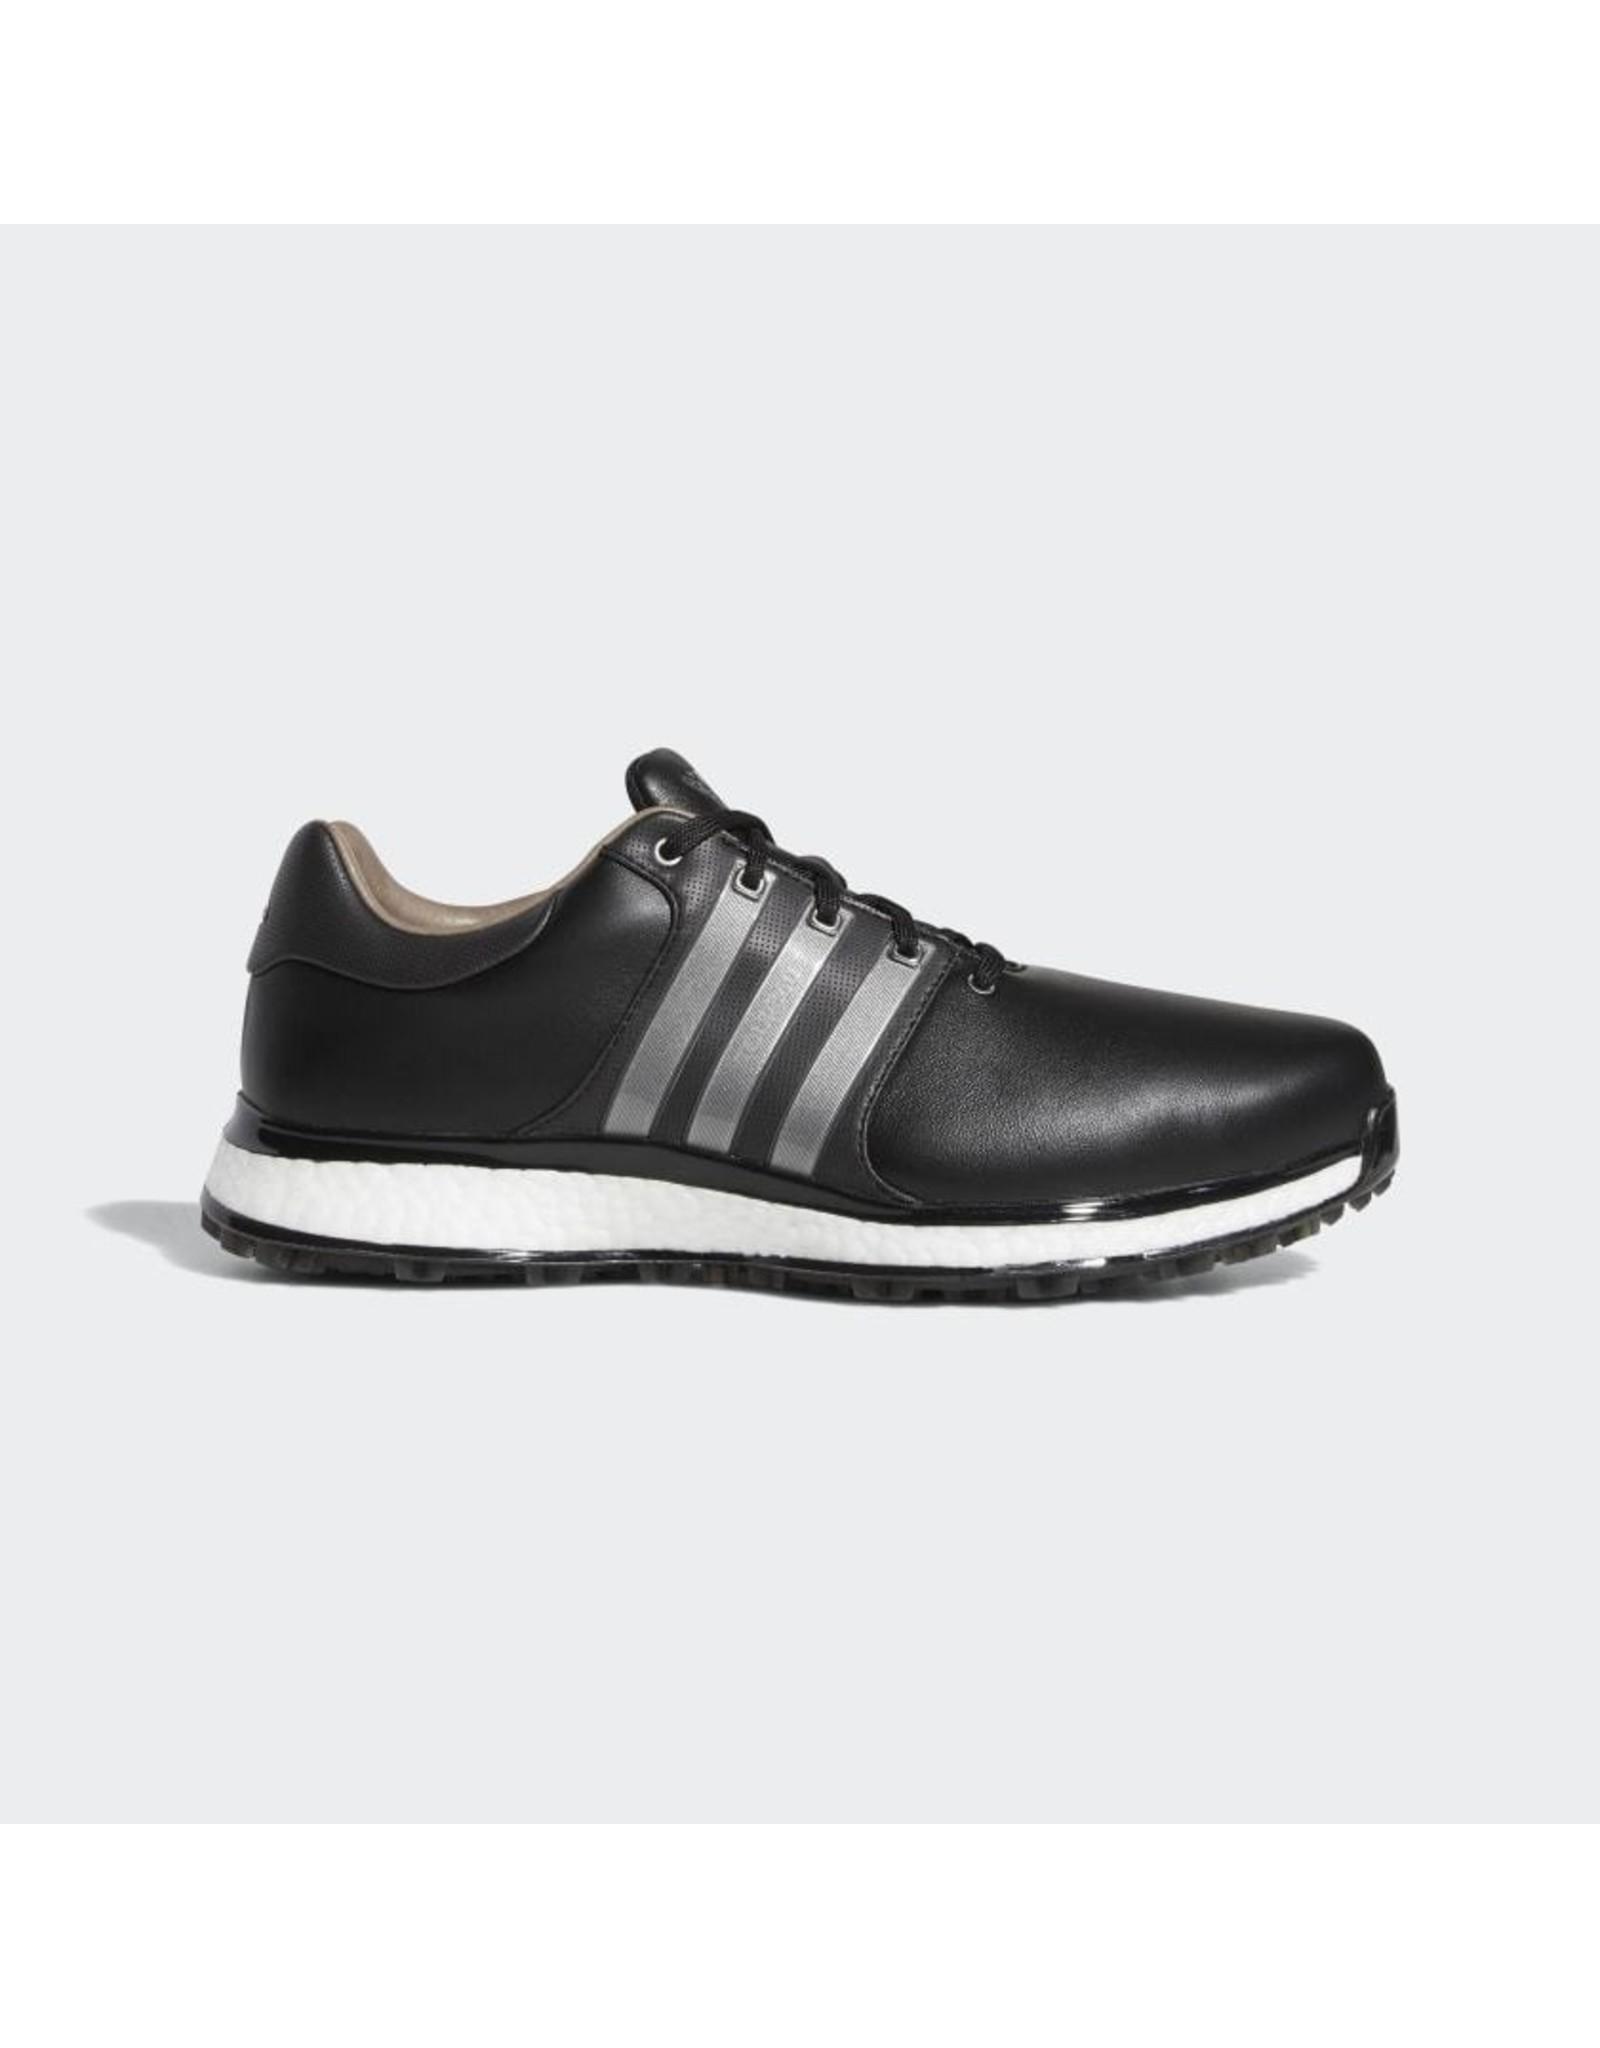 Adidas Adidas TOUR360 XT-SL Black